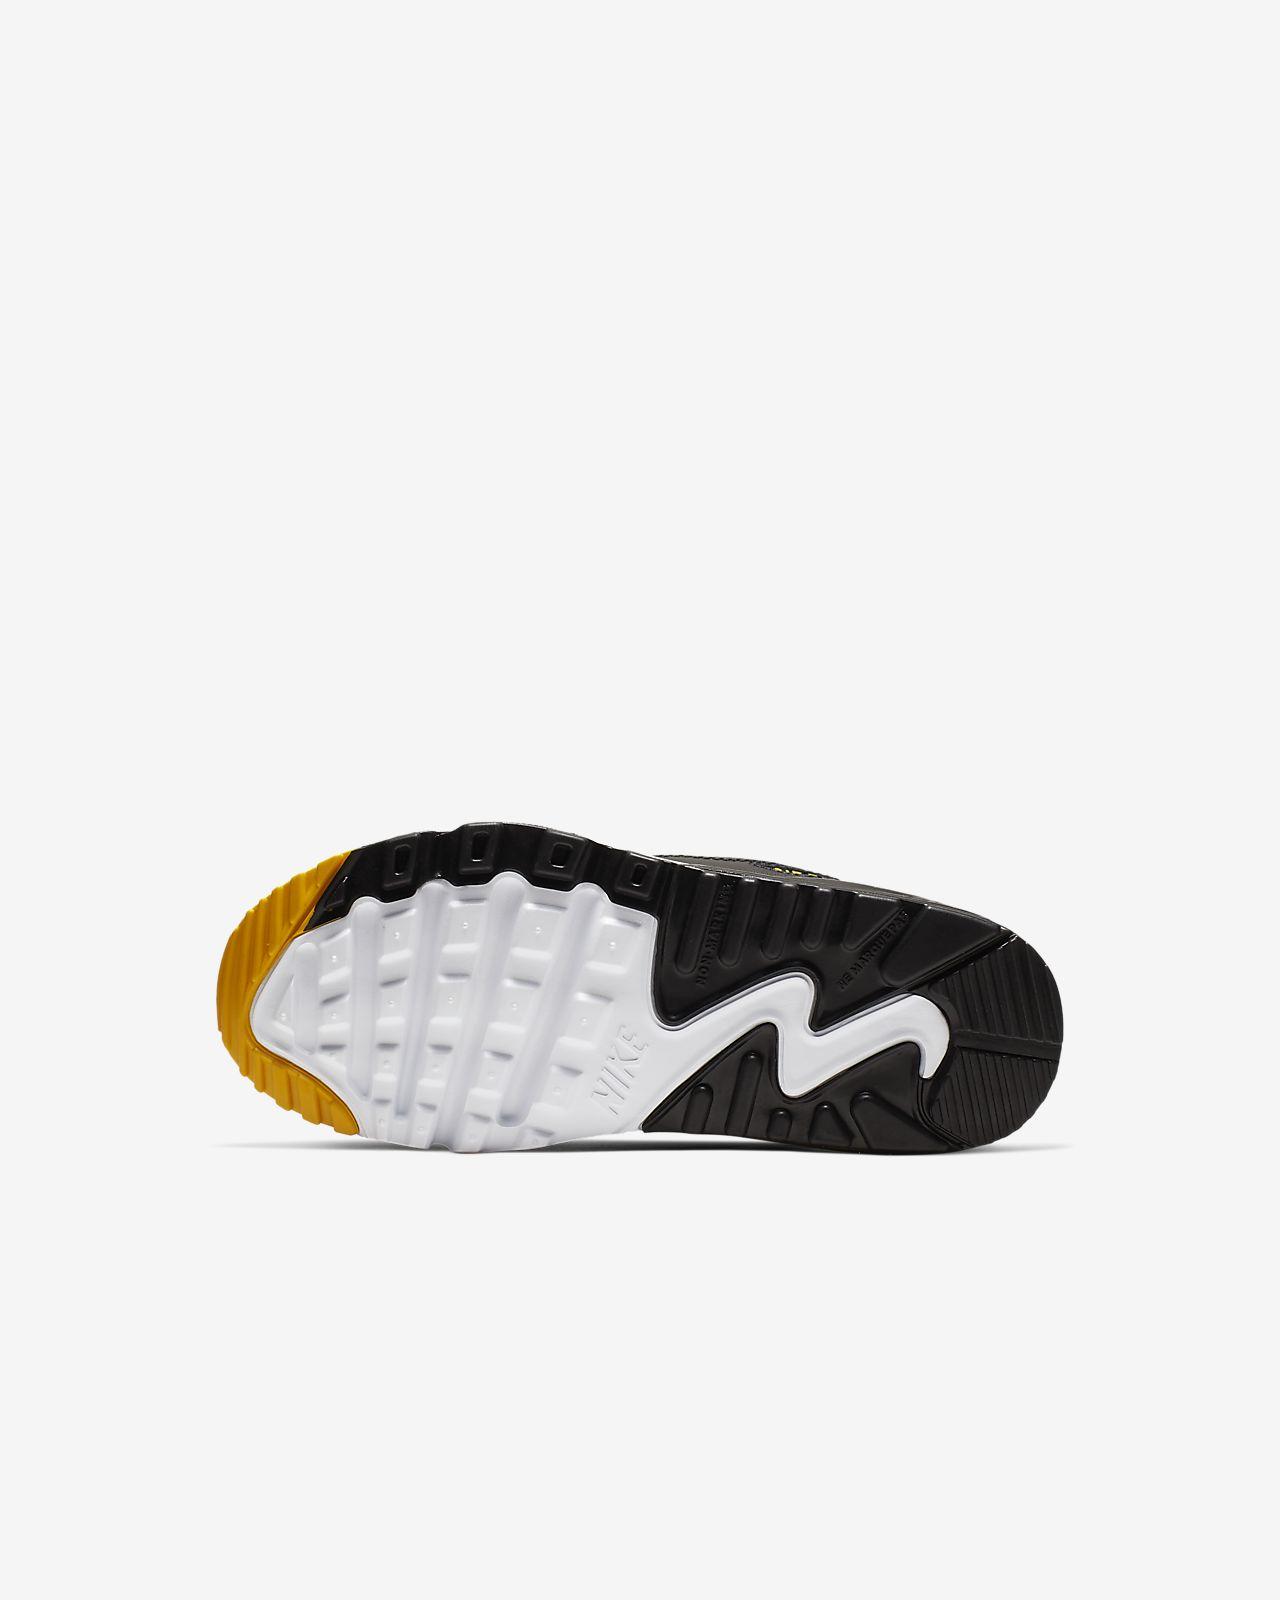 buy popular 31edf 0ad9c ... Nike Air Max 90 Mesh Kleuterschoen (27,5-35)